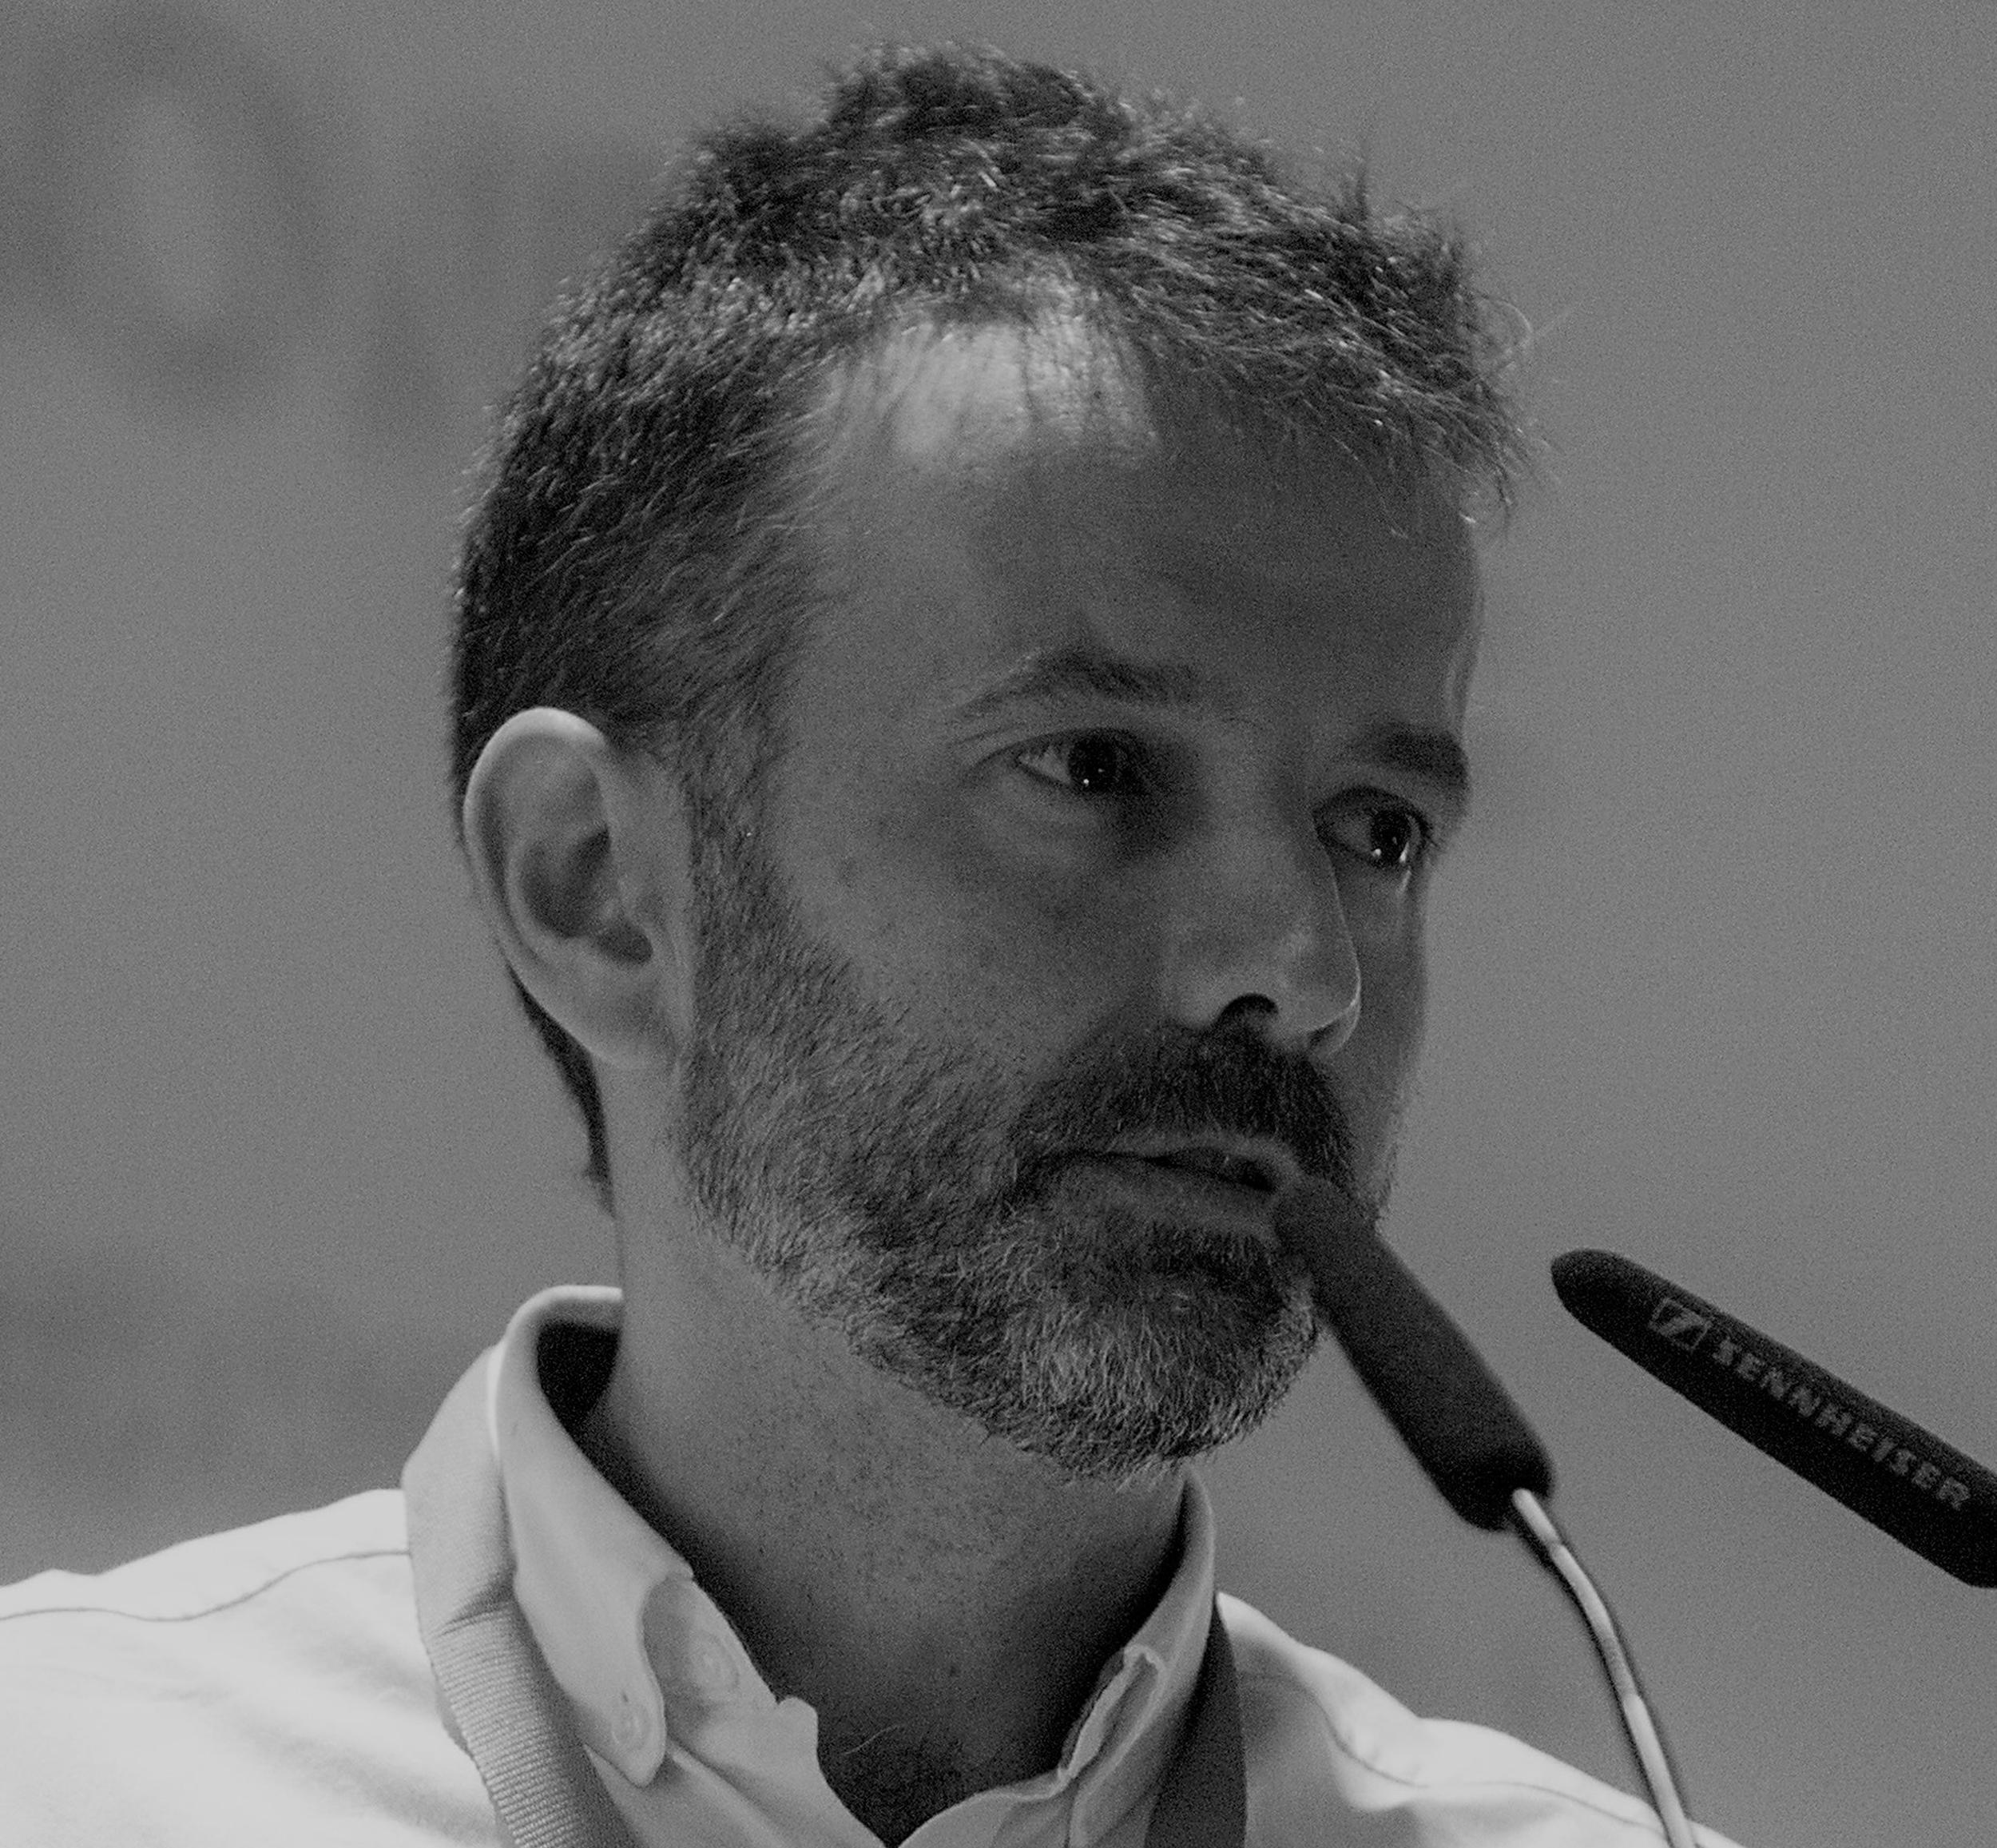 Pedro-Mariñelarena.png